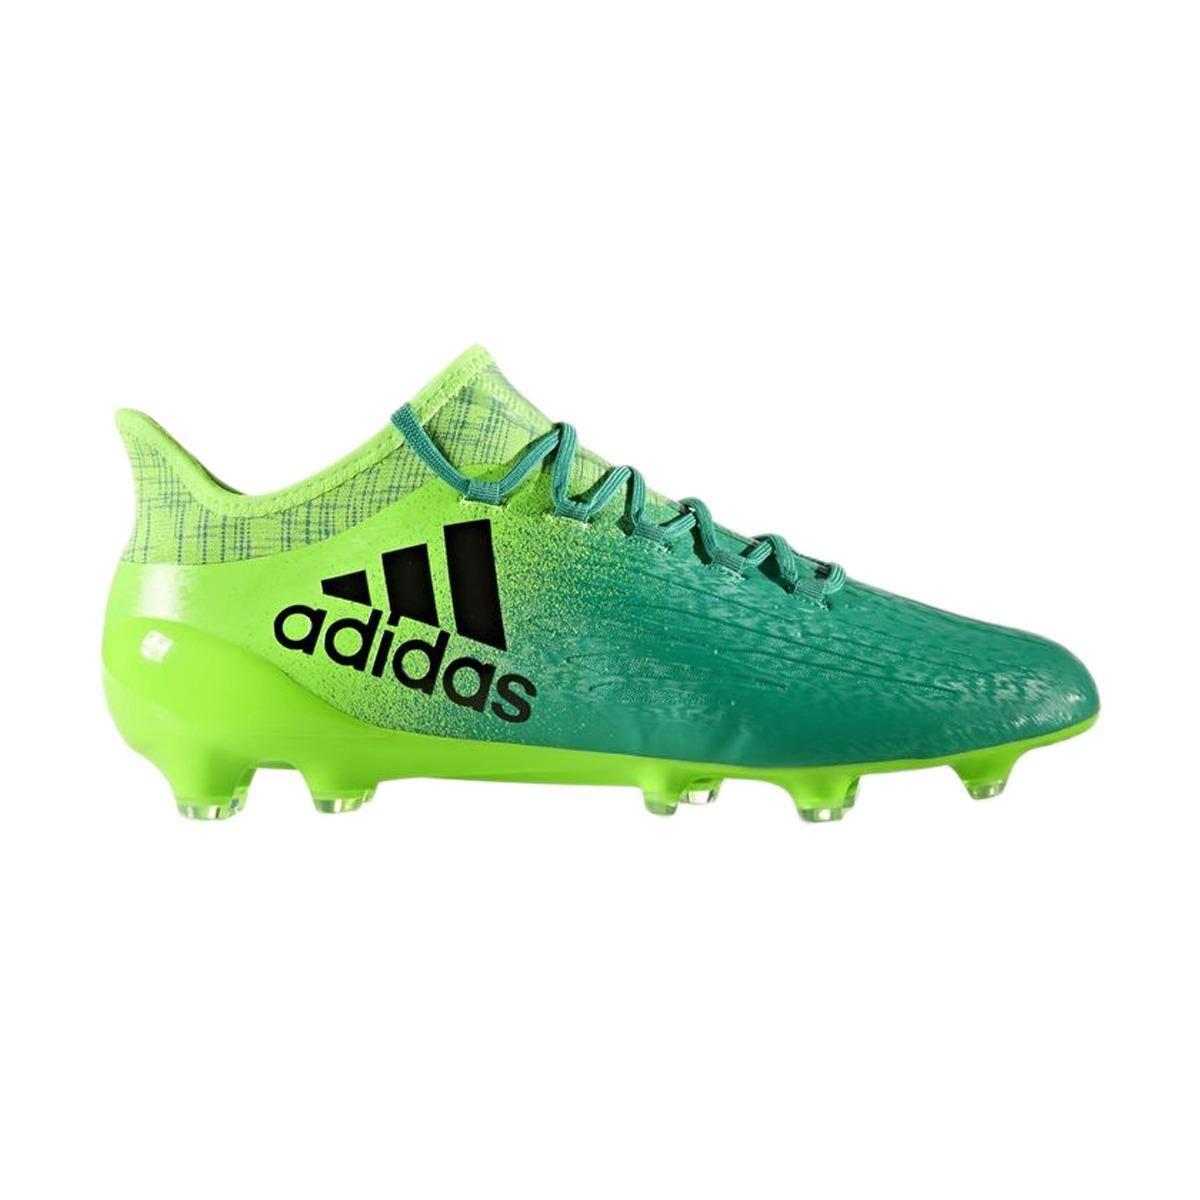 325b7007a8910 Botines Con Tapones adidas Futbol X 16.1 Fg Hombre Vd vf -   3.500 ...